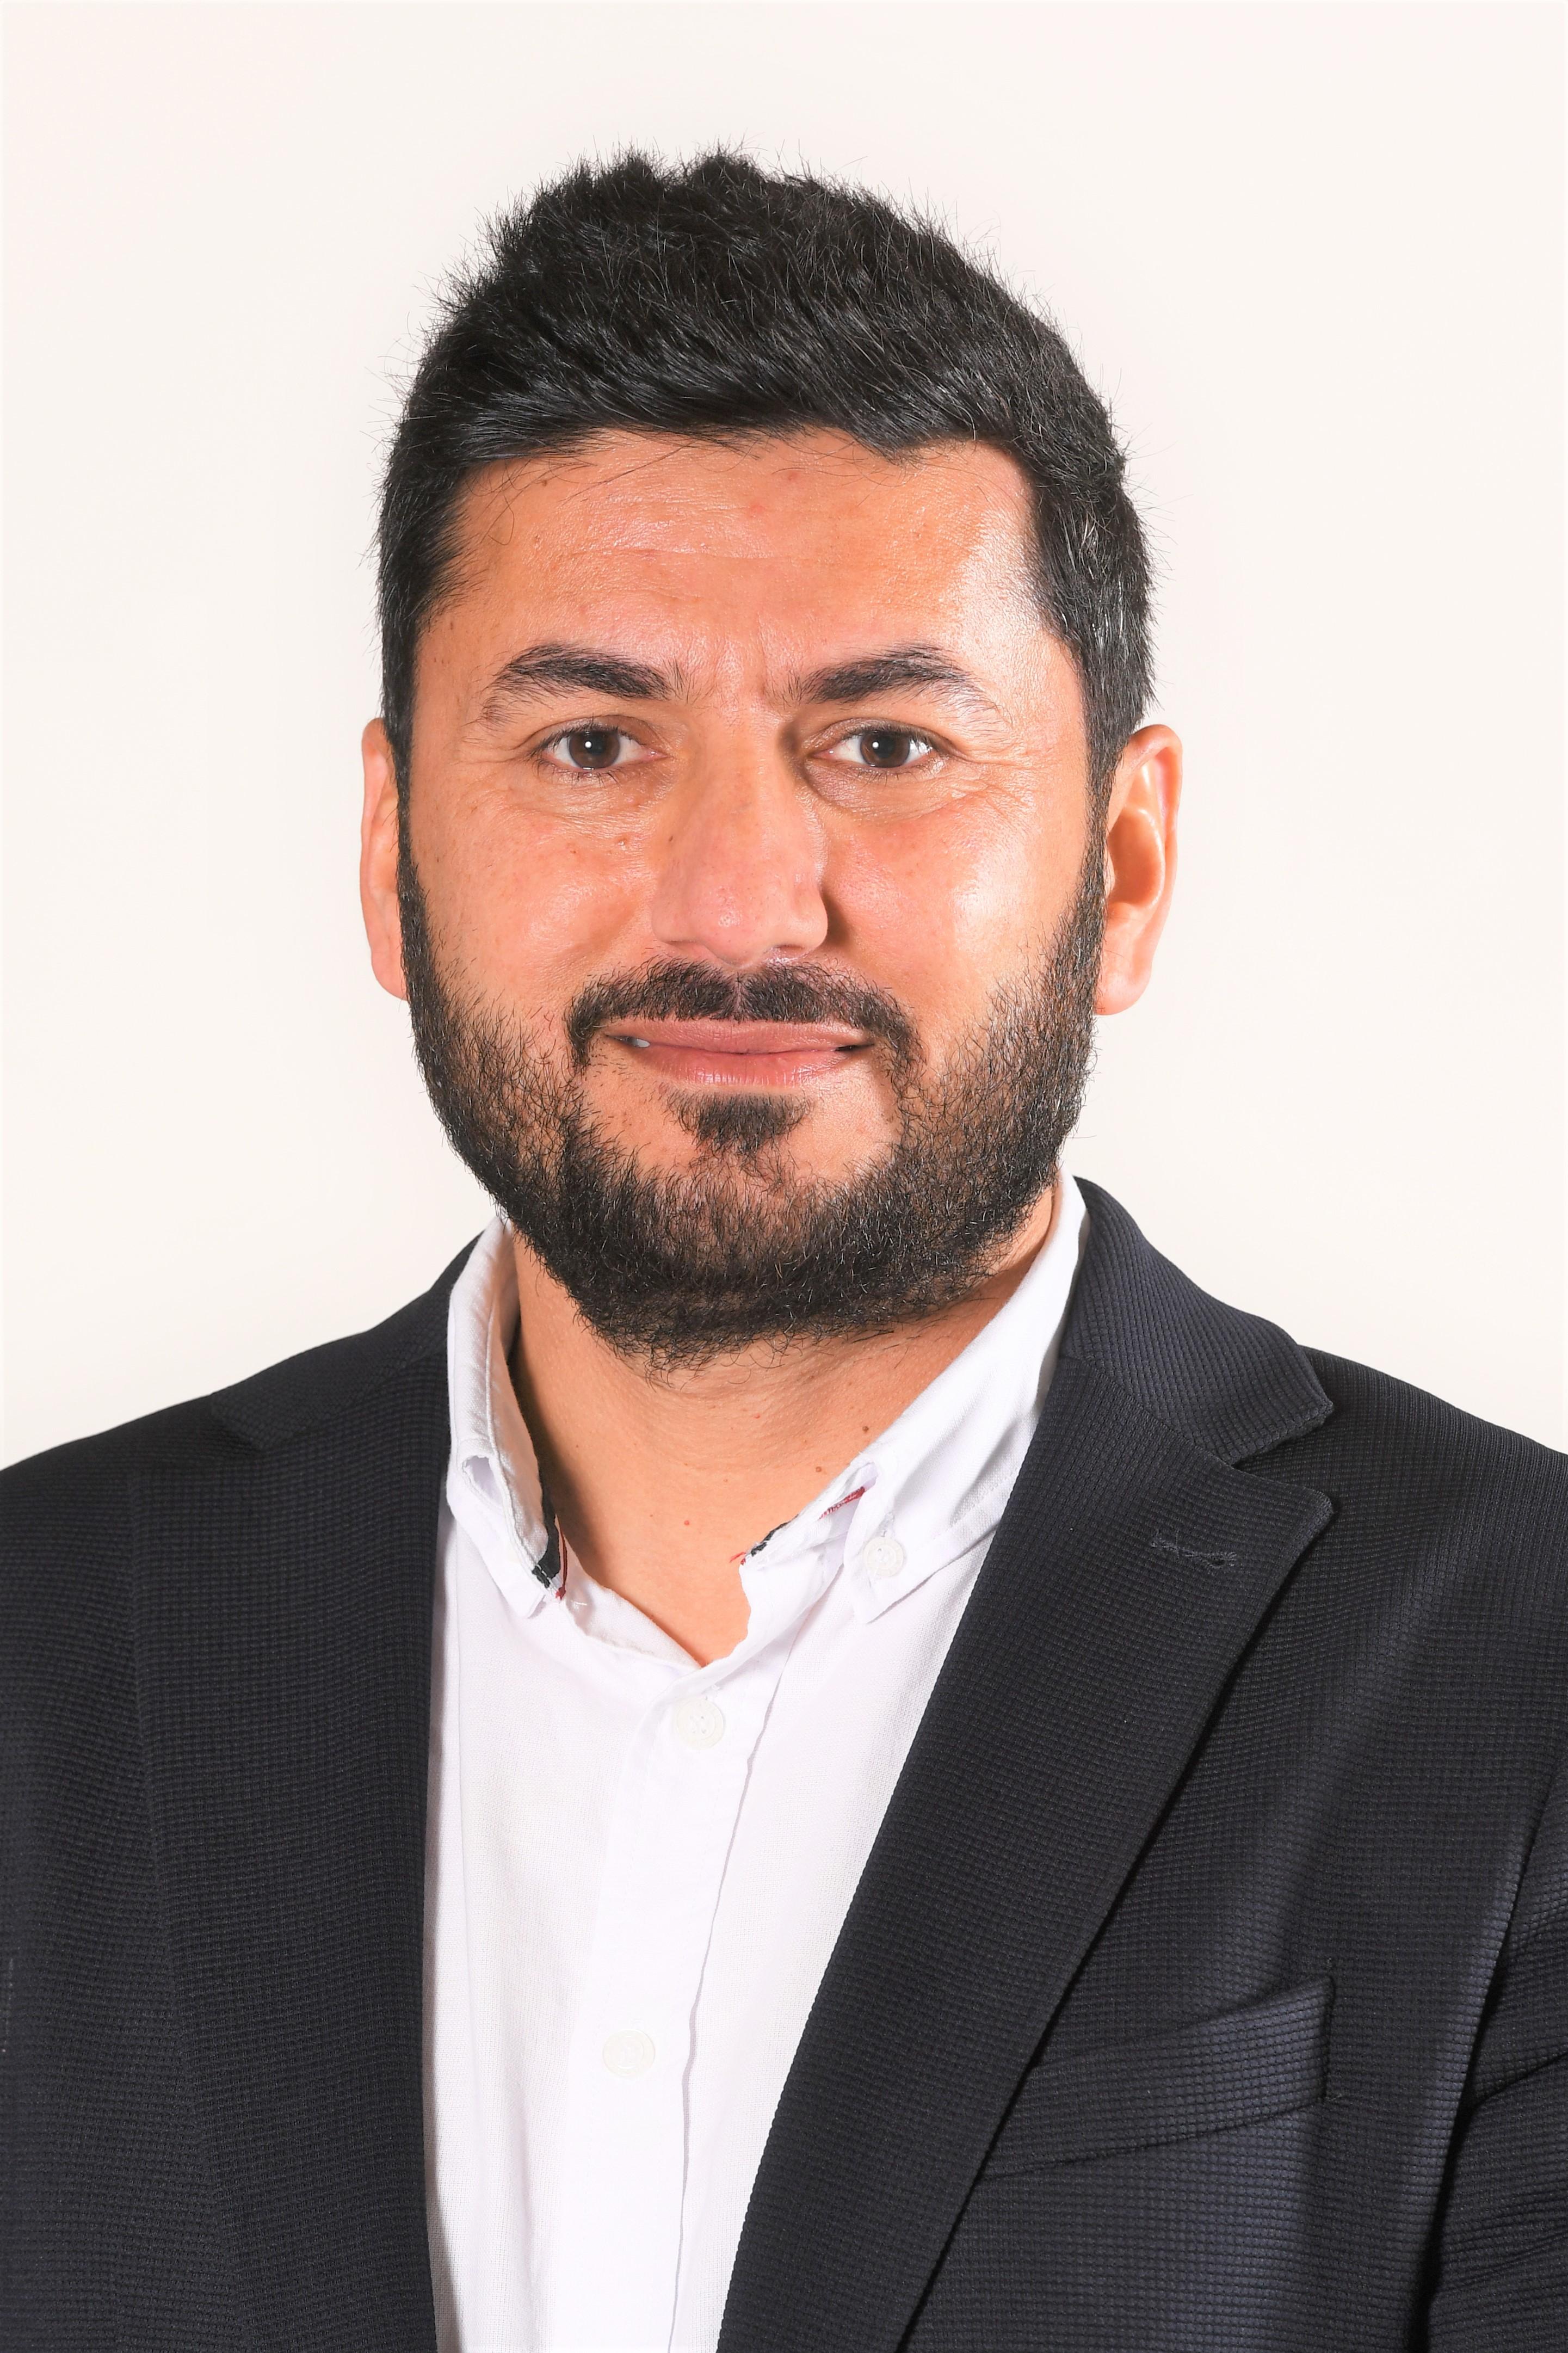 Gohar Khan